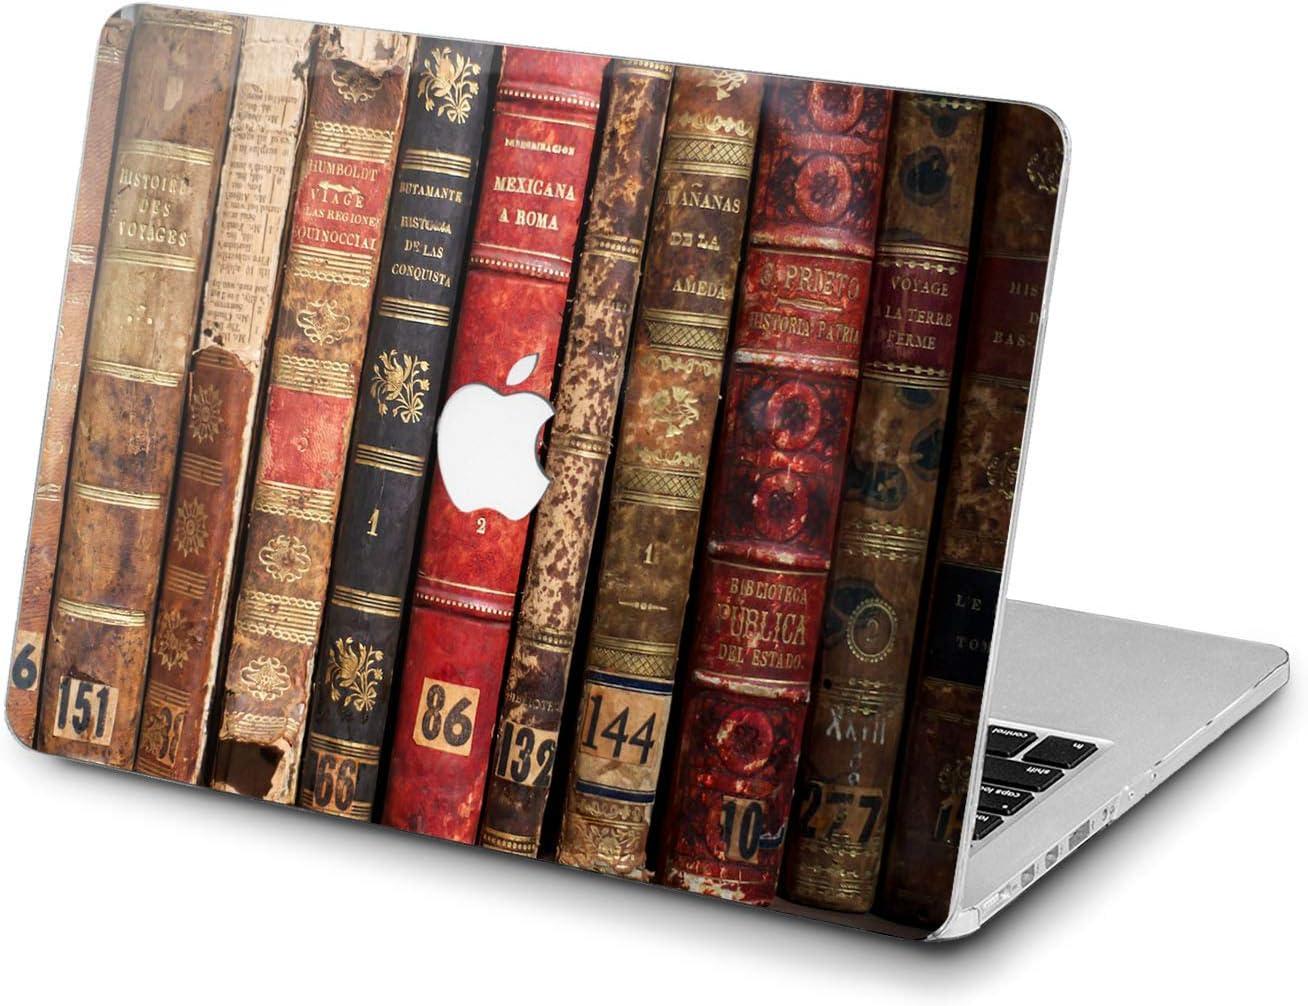 Lex Altern Hard Case for Apple MacBook Pro 15 Air 13 inch Mac Retina 12 11 2020 2019 2018 2017 2016 Typewriter Women Wooden Vintage Plastic Steampunk Retro Design Touch Bar Shell Cover Fashioned